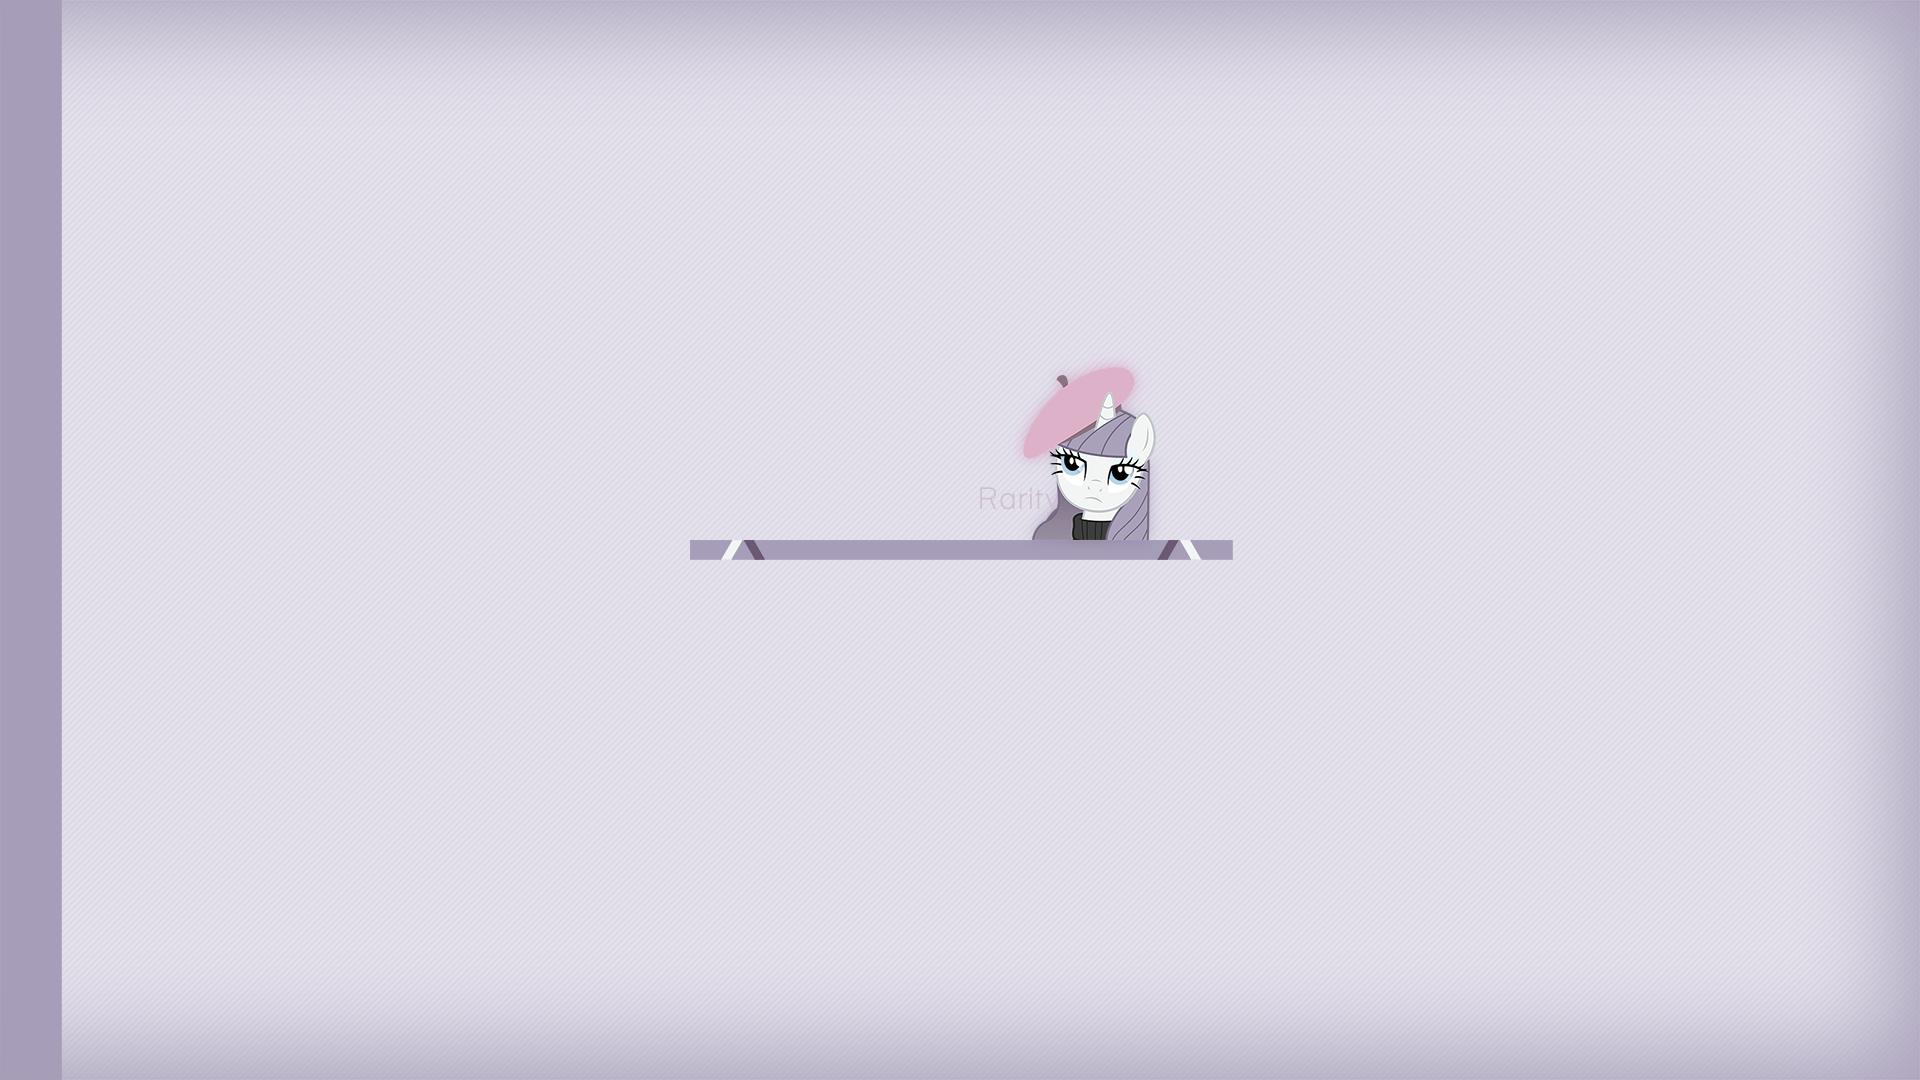 Rarity (wallpaper - simple) by Mac3030 and Mihaaaa